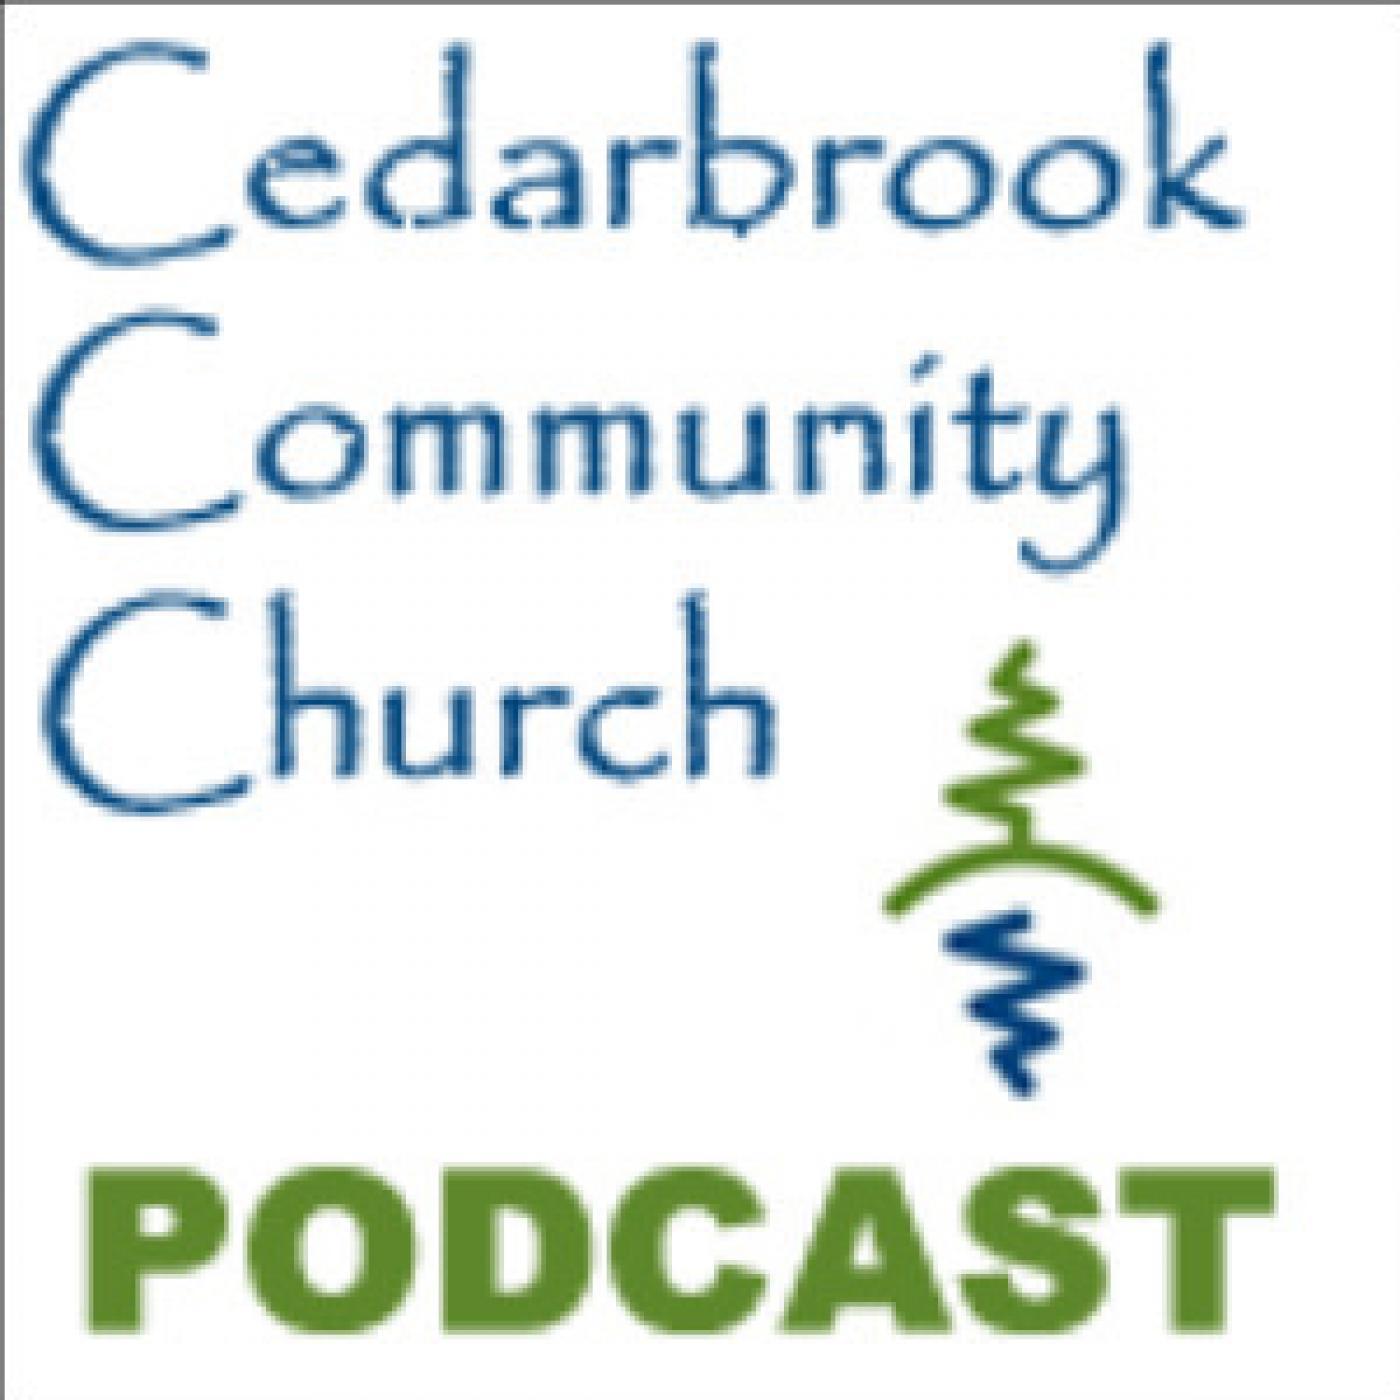 Cedarbrook Community Church